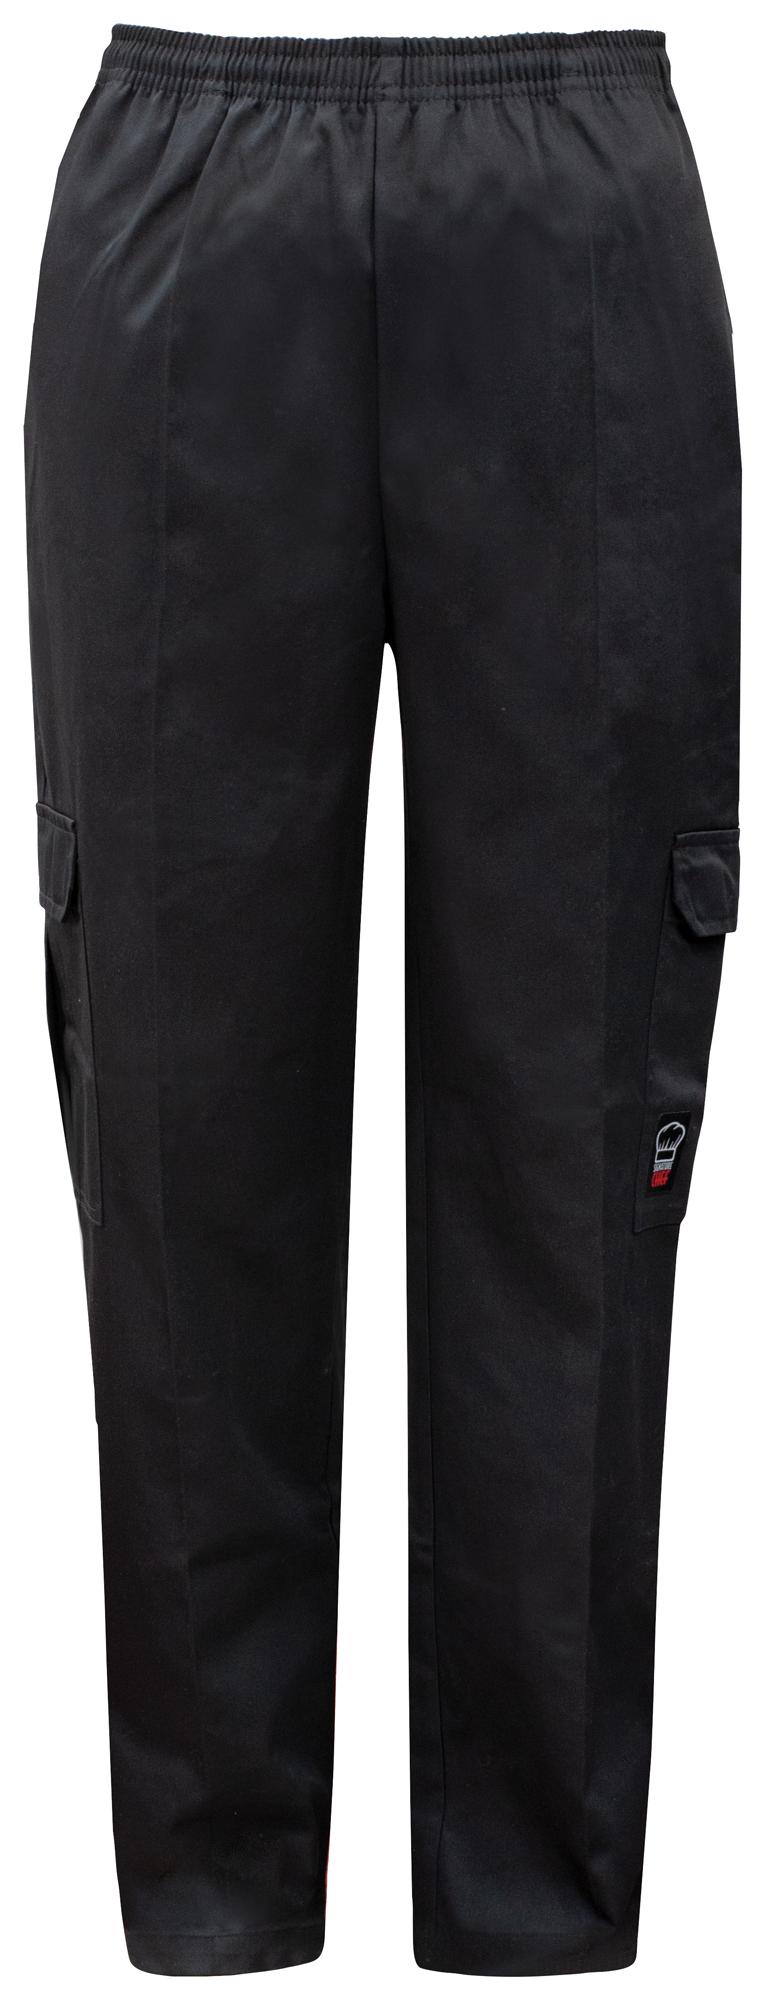 Winco UNF-11KXXL cargo chef pants